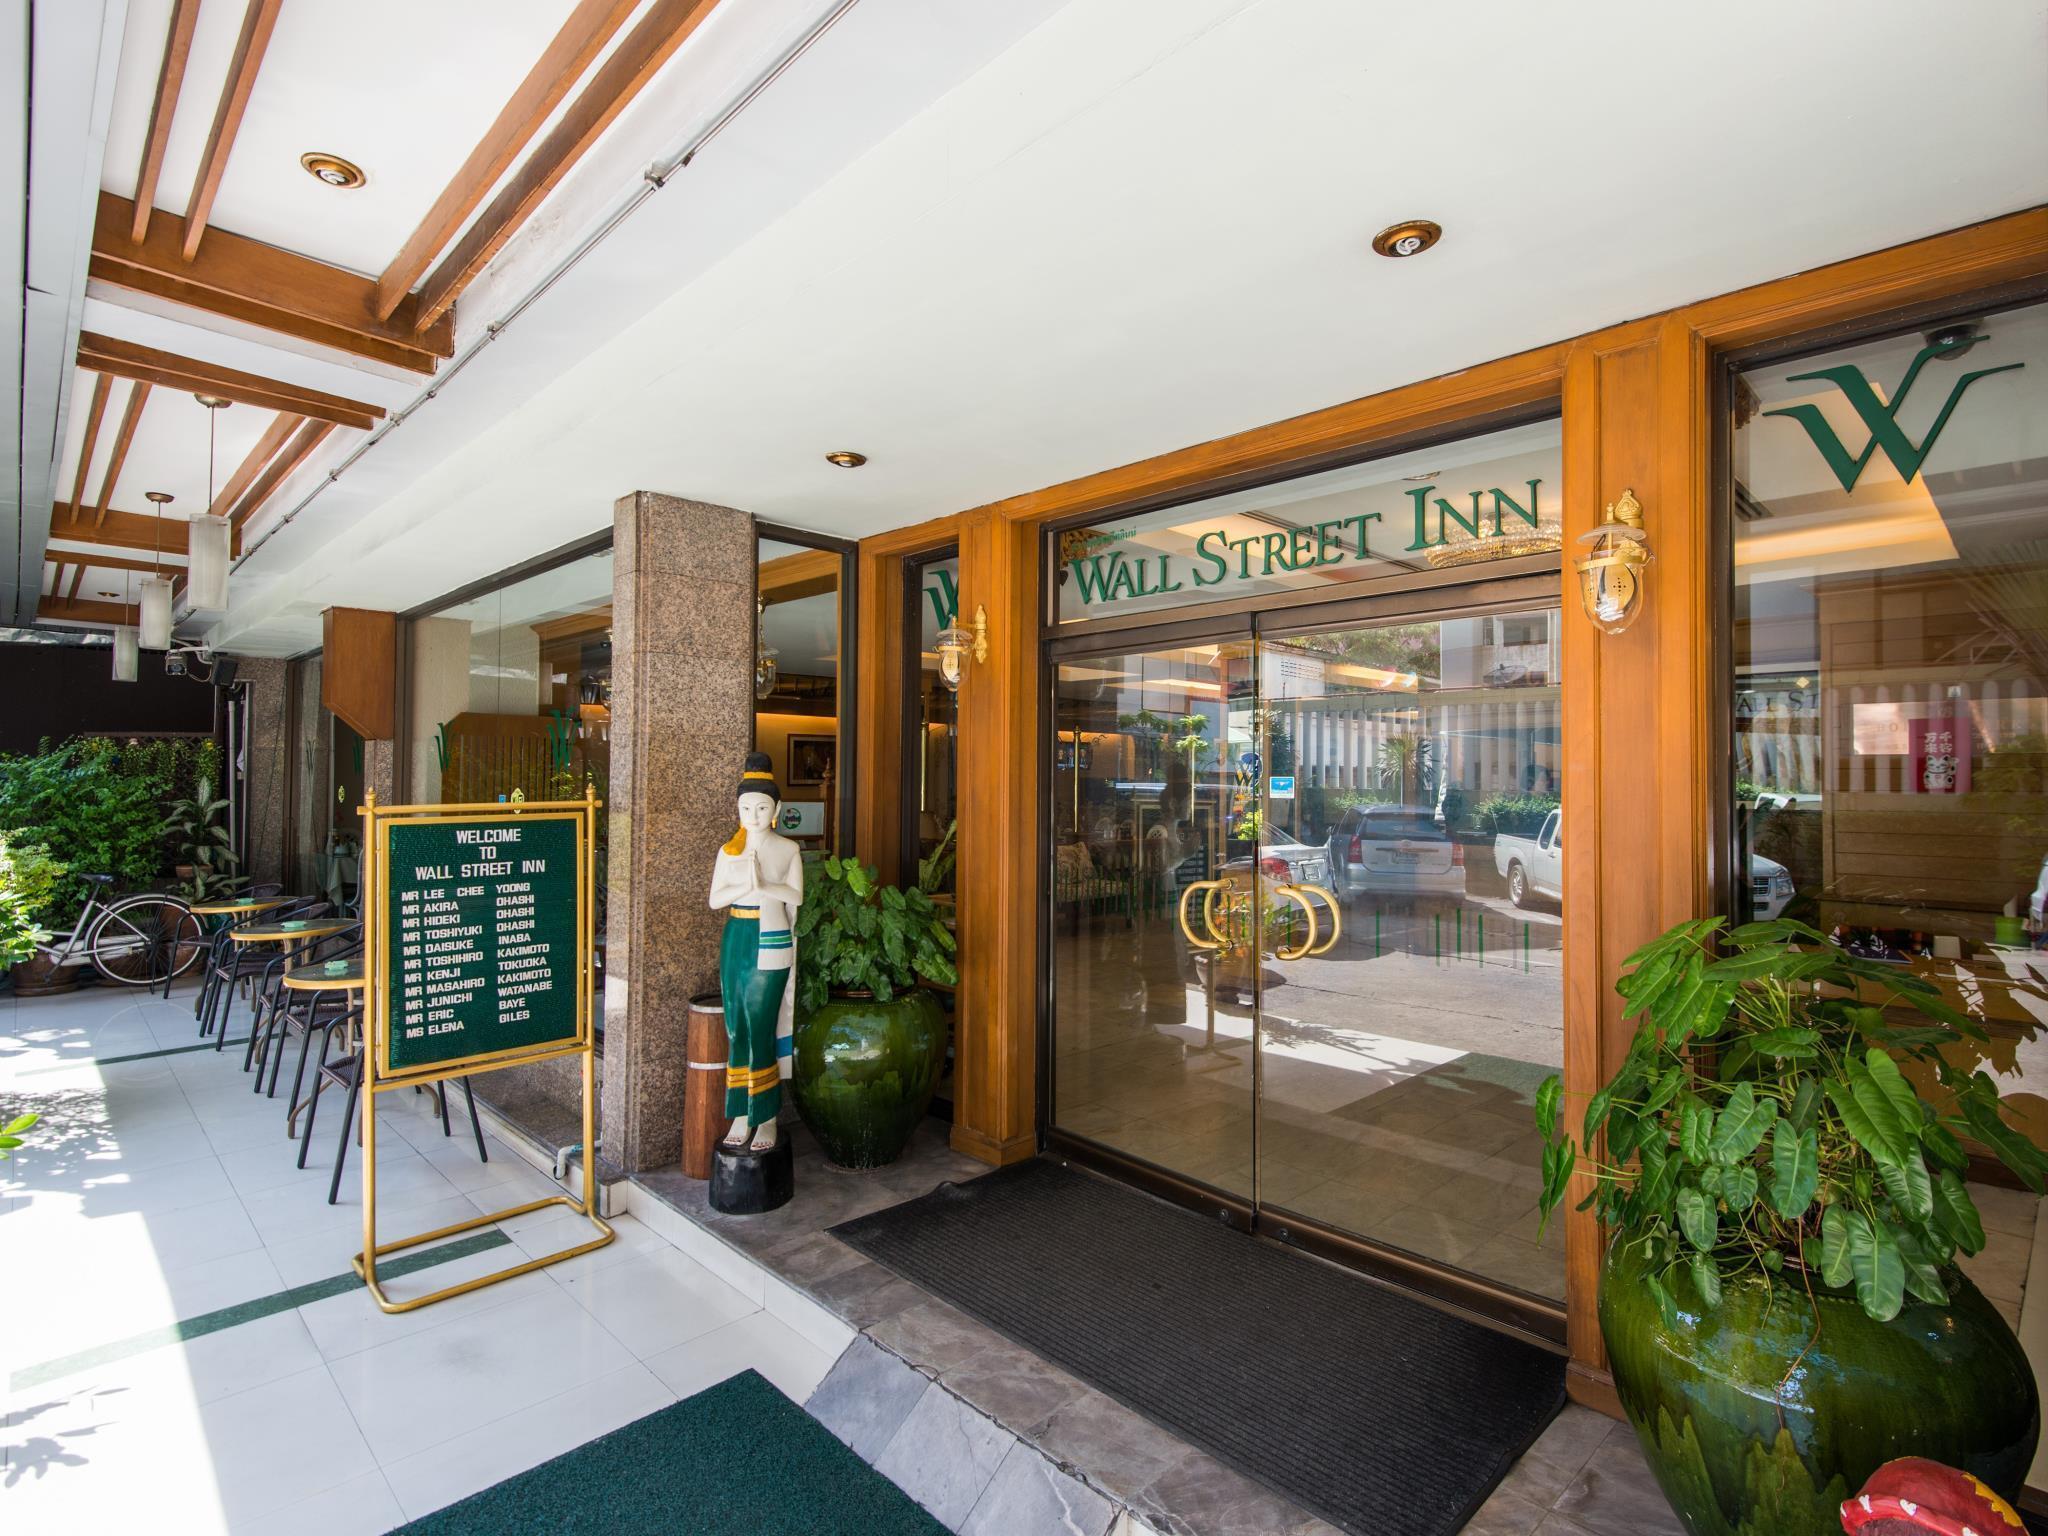 Wall Street Inn Hotel โรงแรมวอลล์สตรีท อินน์